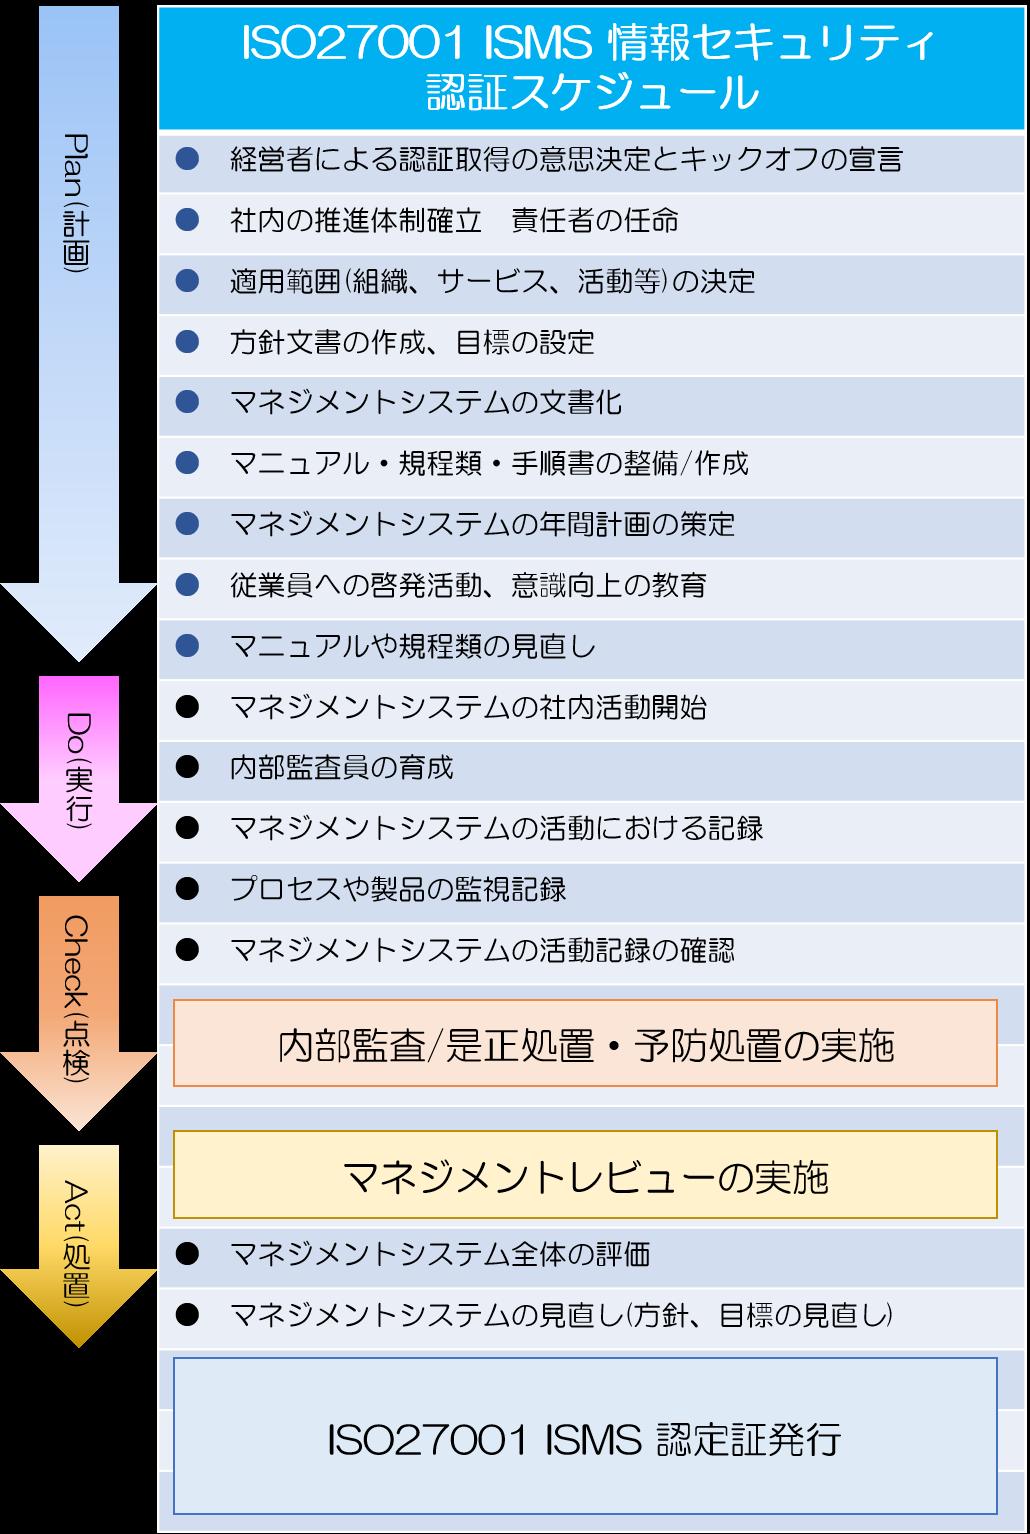 ISMSスケジュール